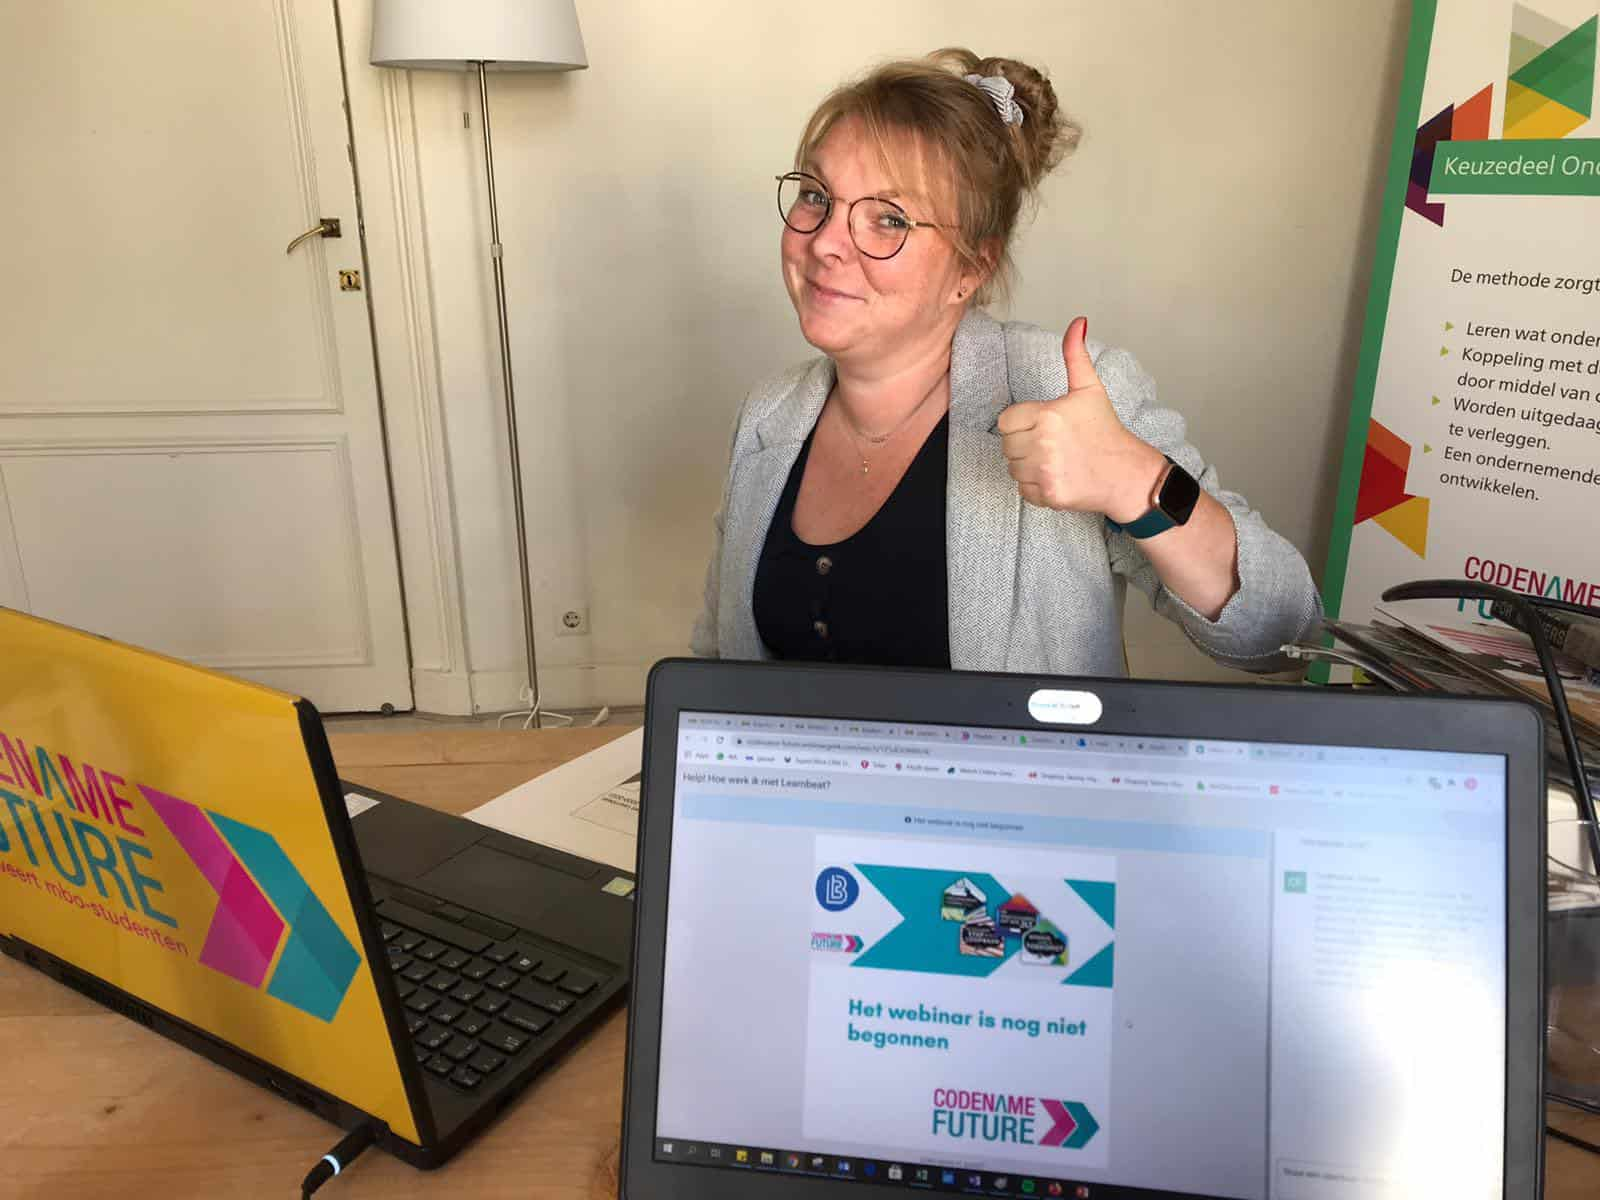 Loopbaan - burgerschap - ondernemend gedrag - nederlands - mbo - webinars